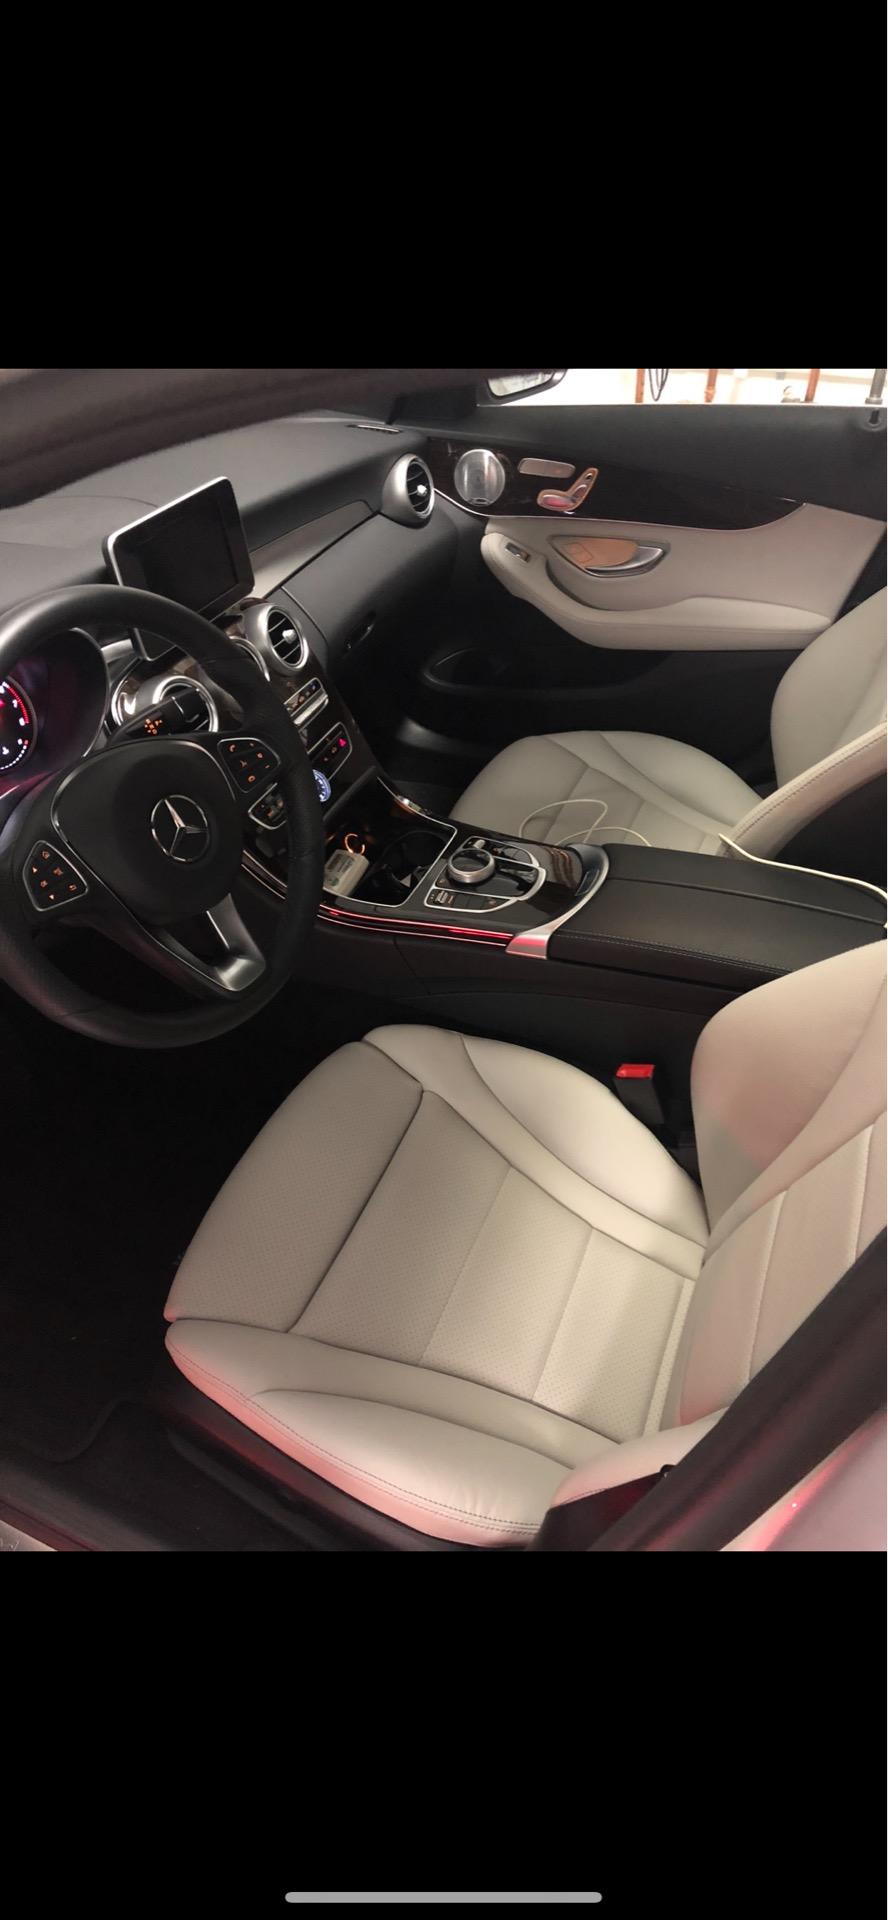 2018 Mercedes-Benz C-Class - photo 3